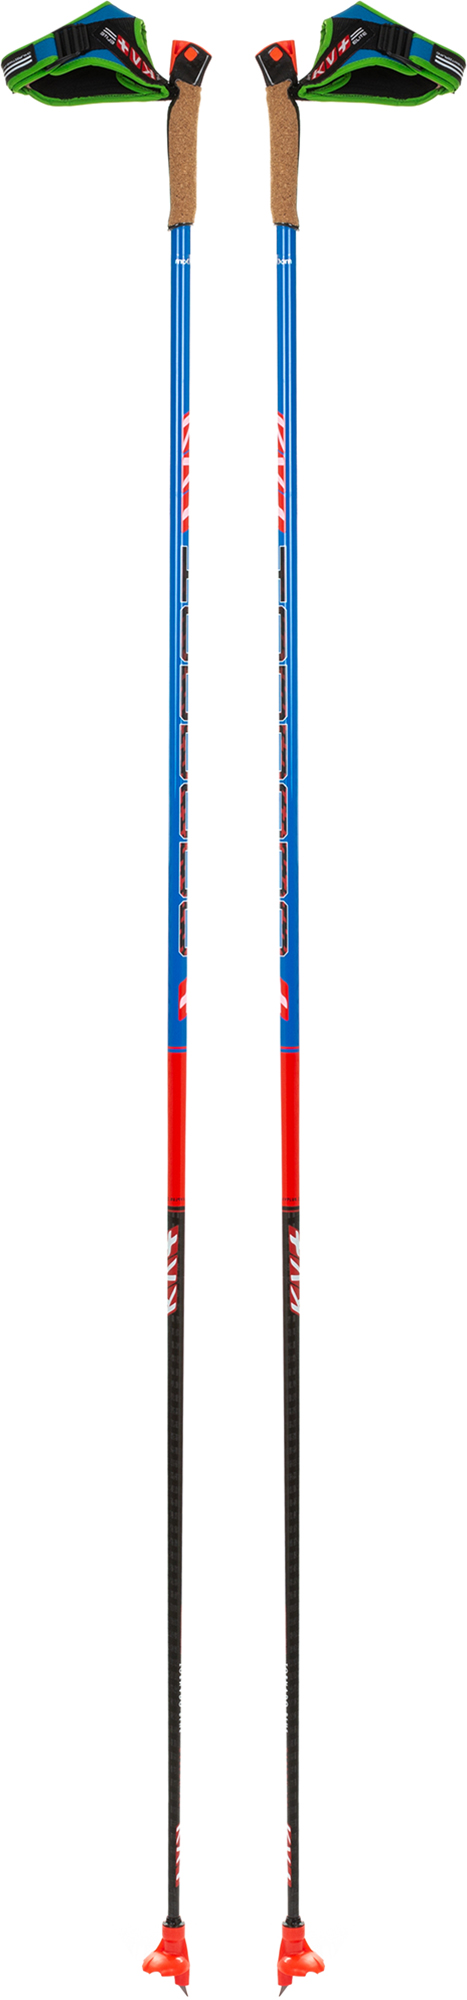 KV+ Палки для беговых лыж KV+ Tornado Plus Carbon kv adula clip